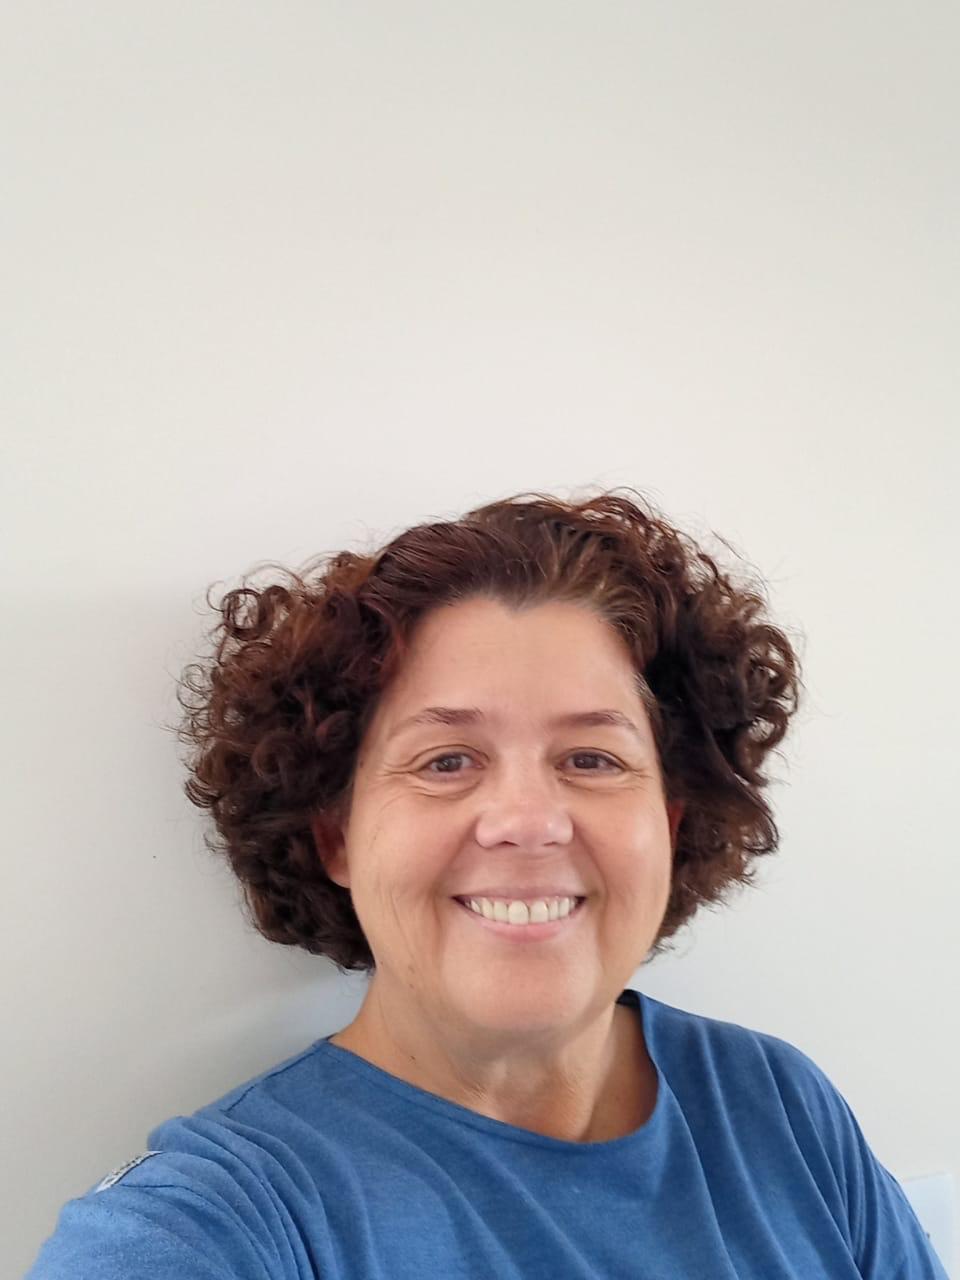 Rosemary Romagnolli